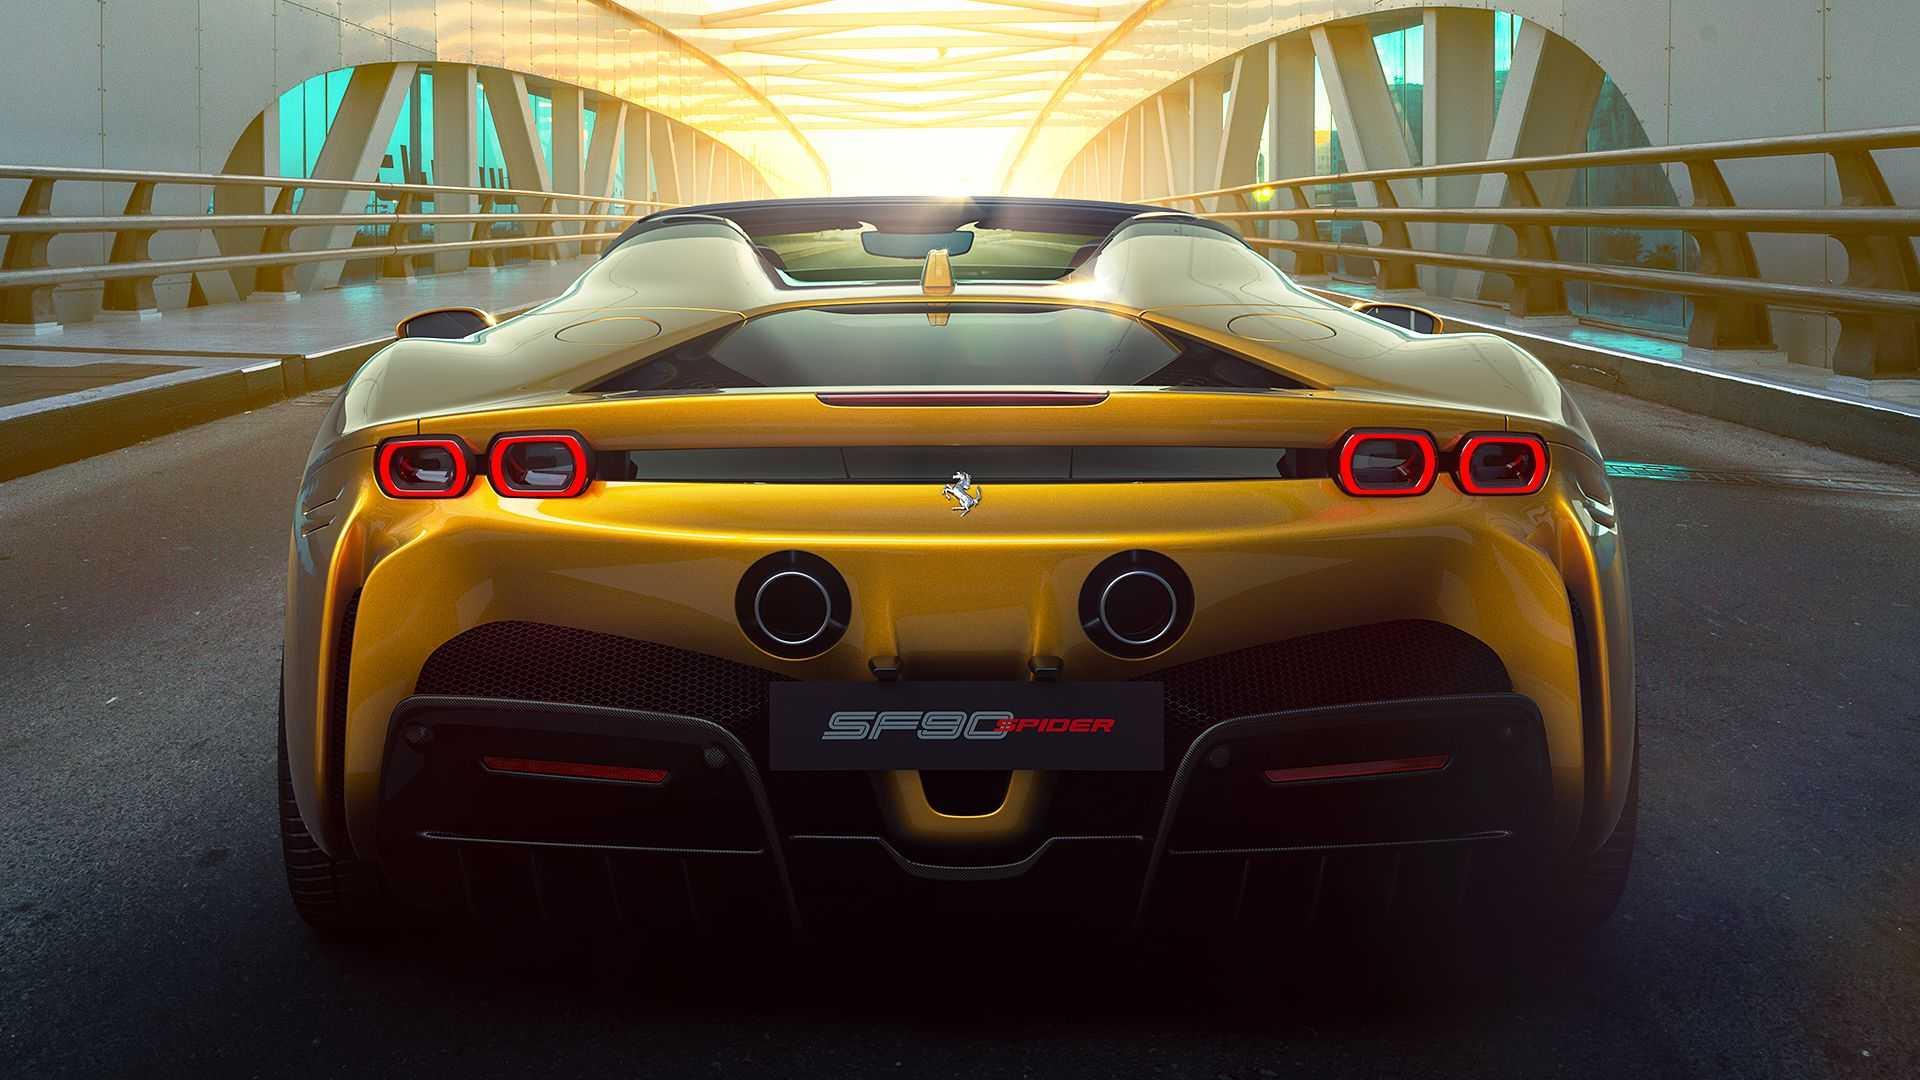 Superhybryda Ferrari SF90 Spider